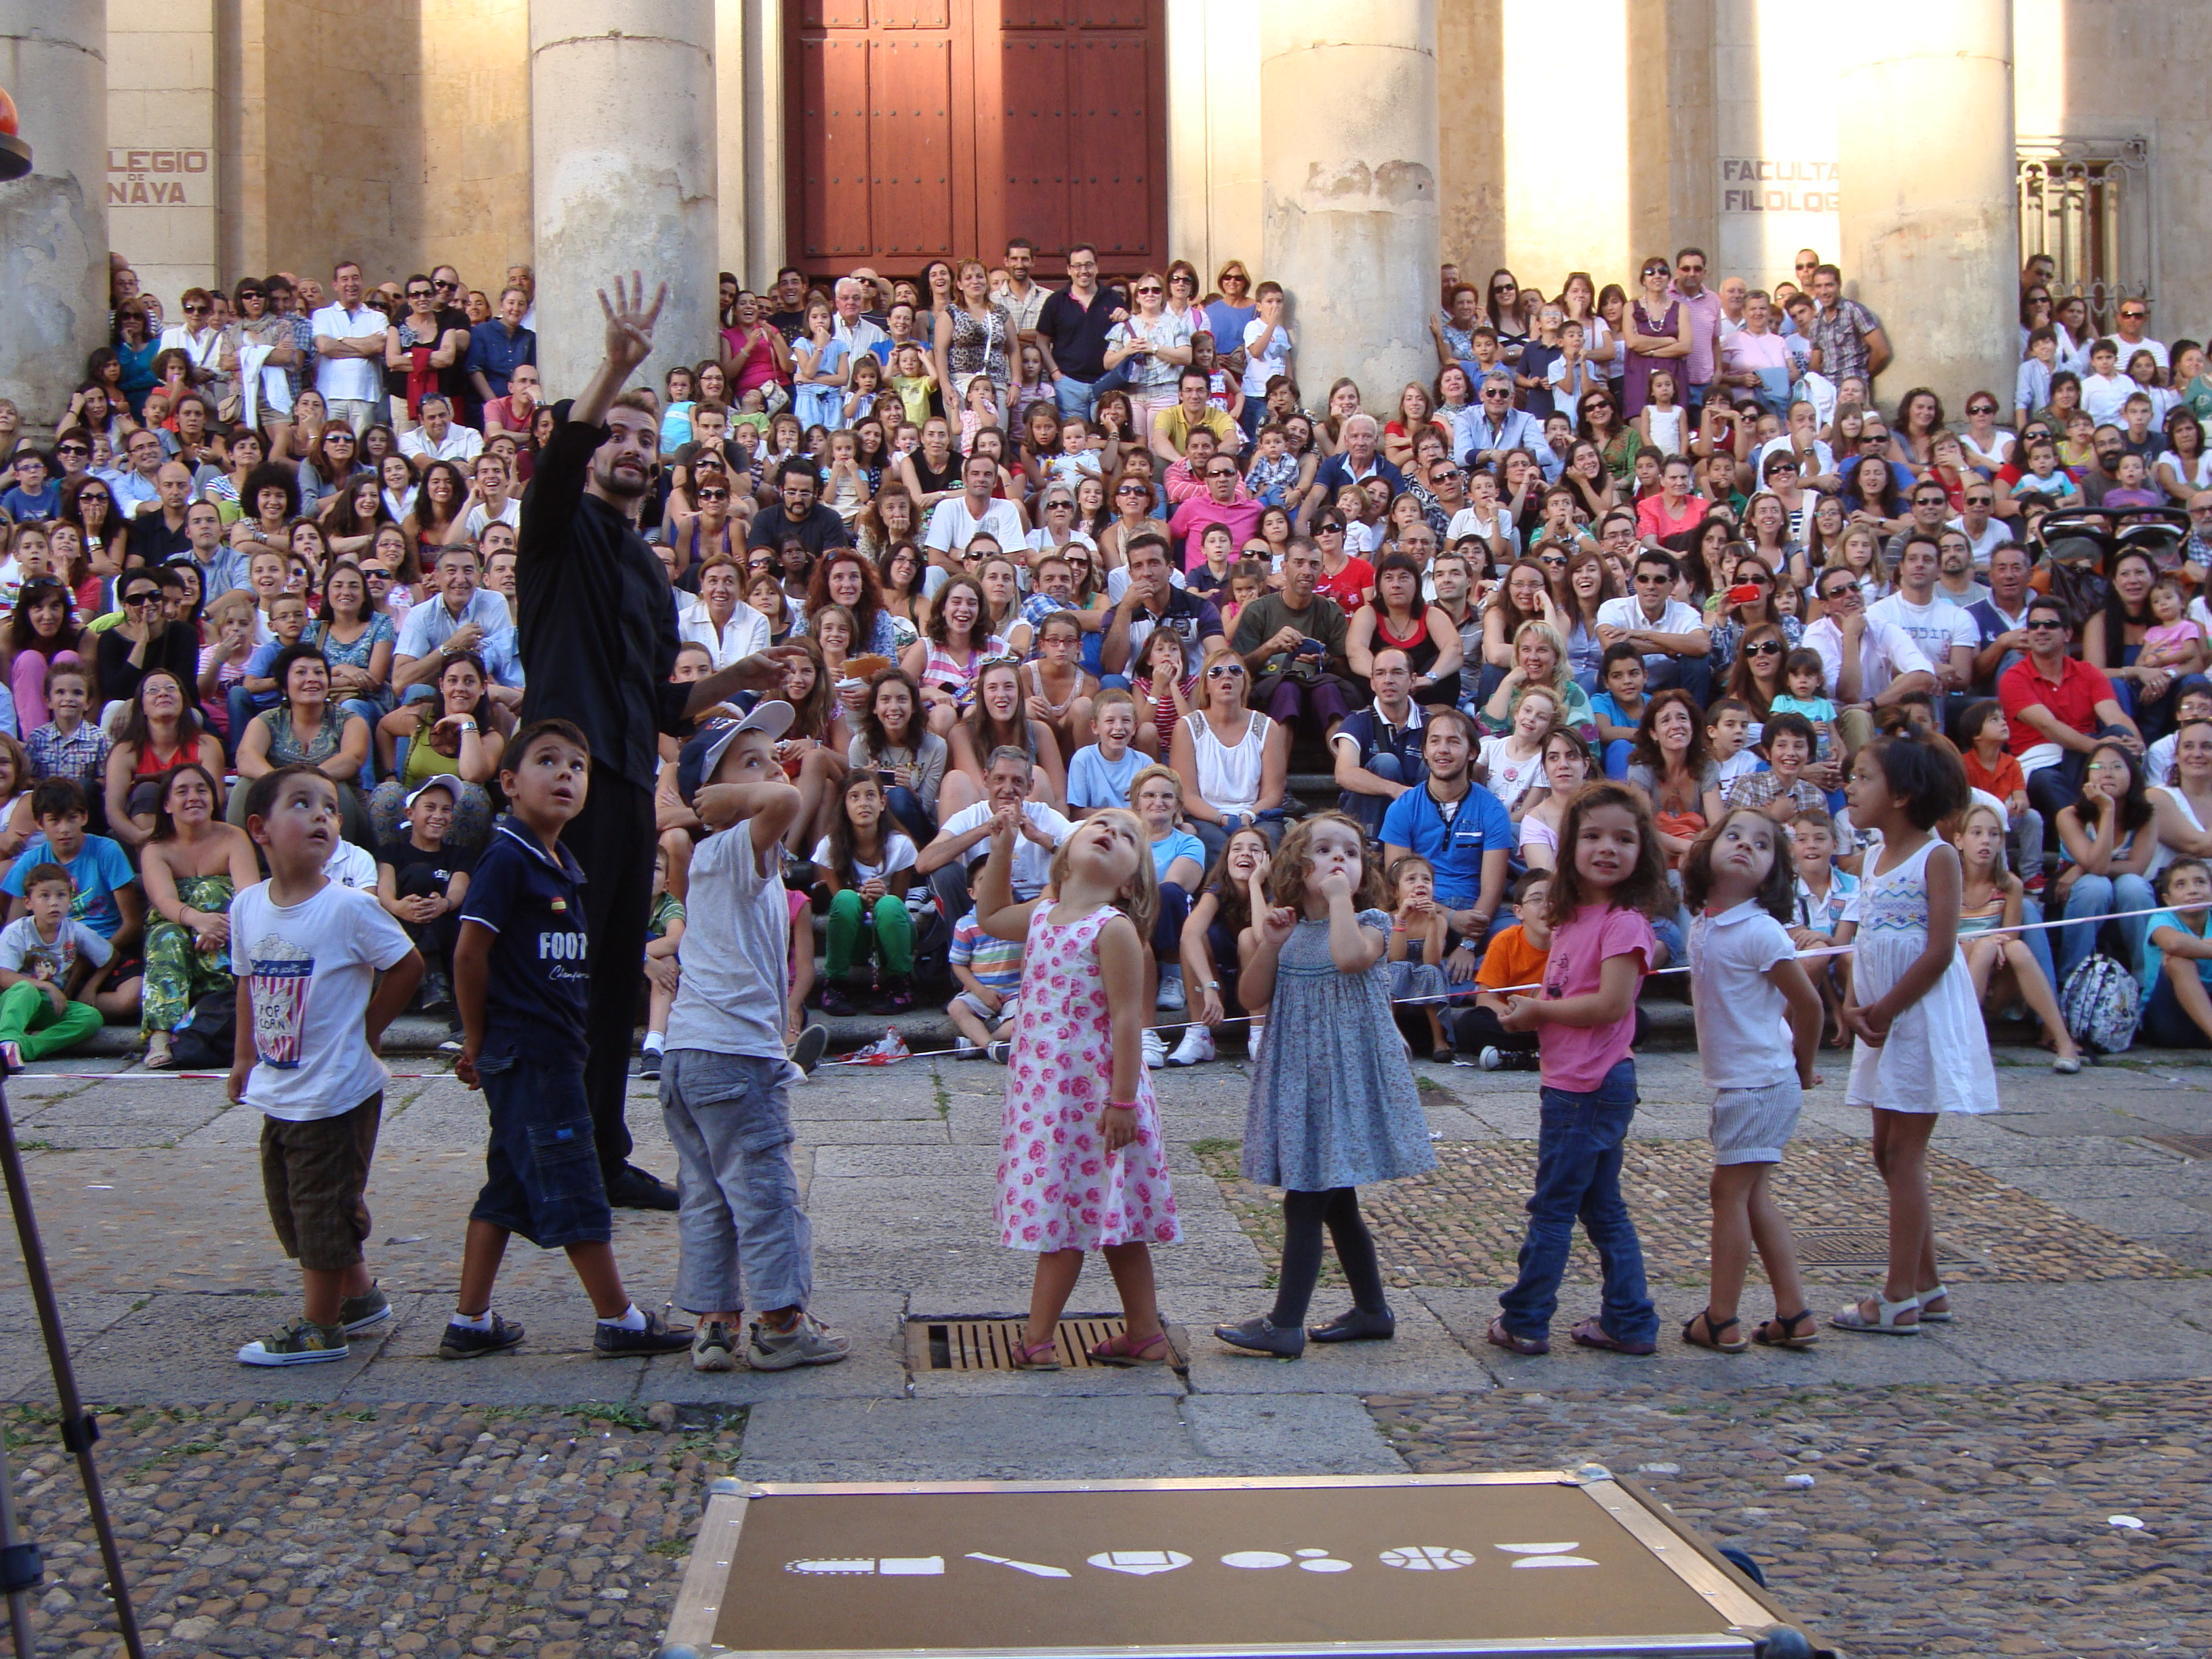 VII Festival Internacional de Artes de Calle de Salamanca 2013